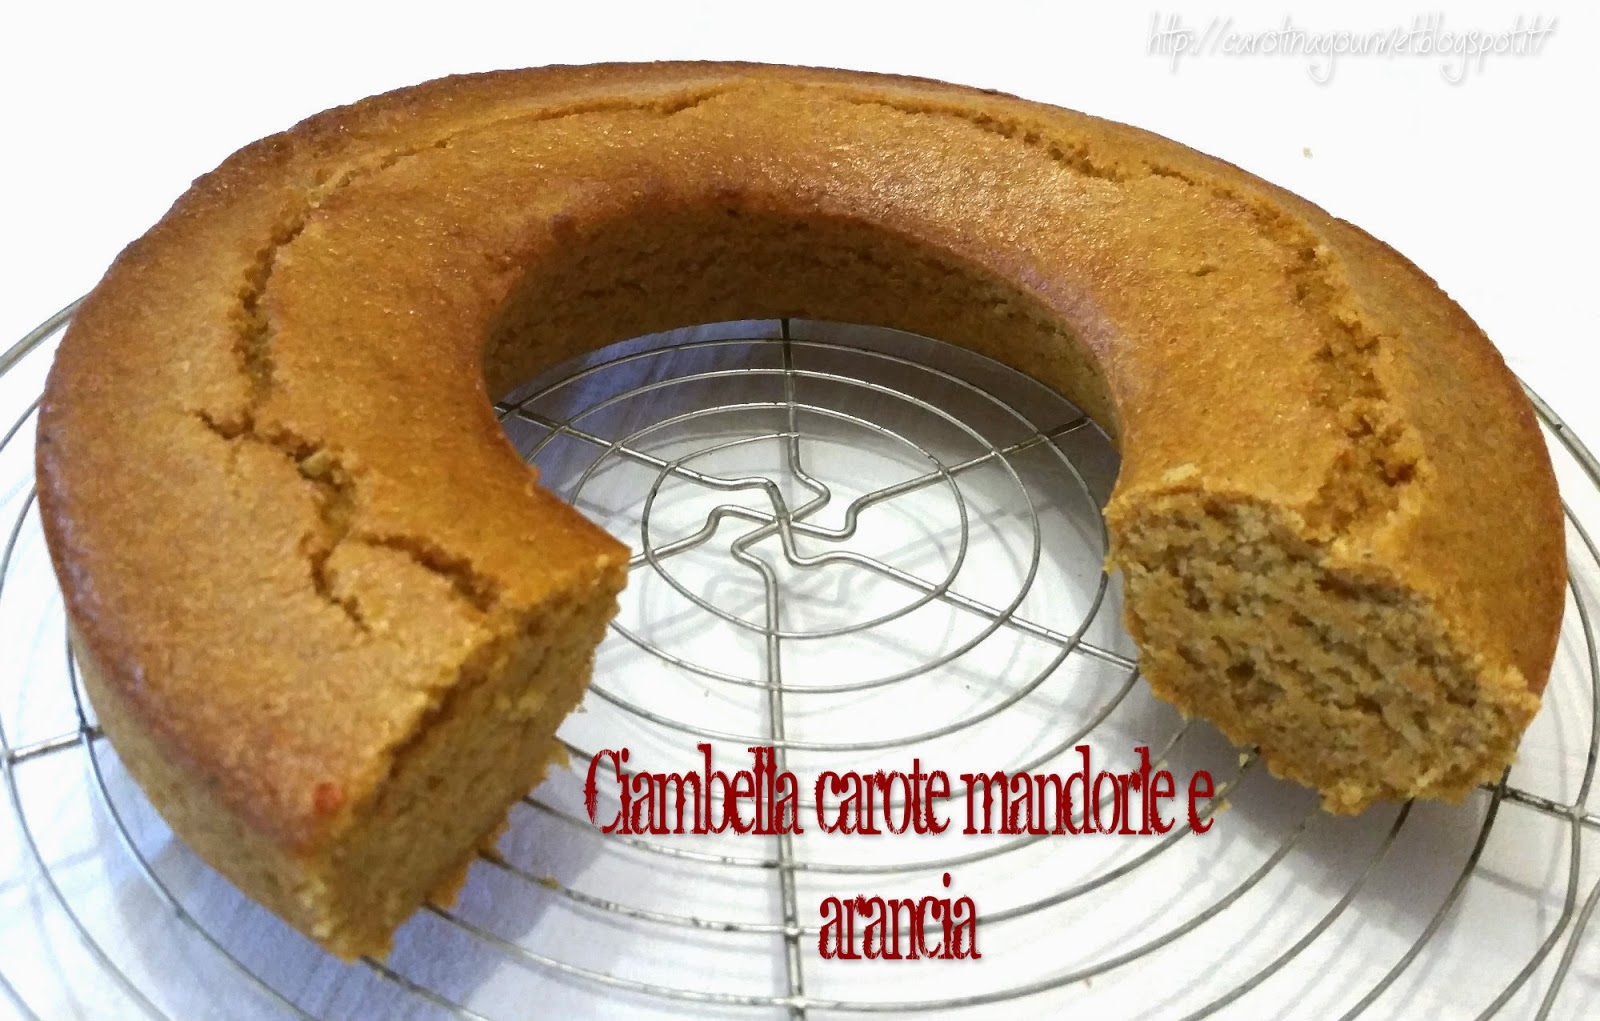 Fotografia del dolce Ciambella carota mandorle e arancia dal blog Carotina Gourmet